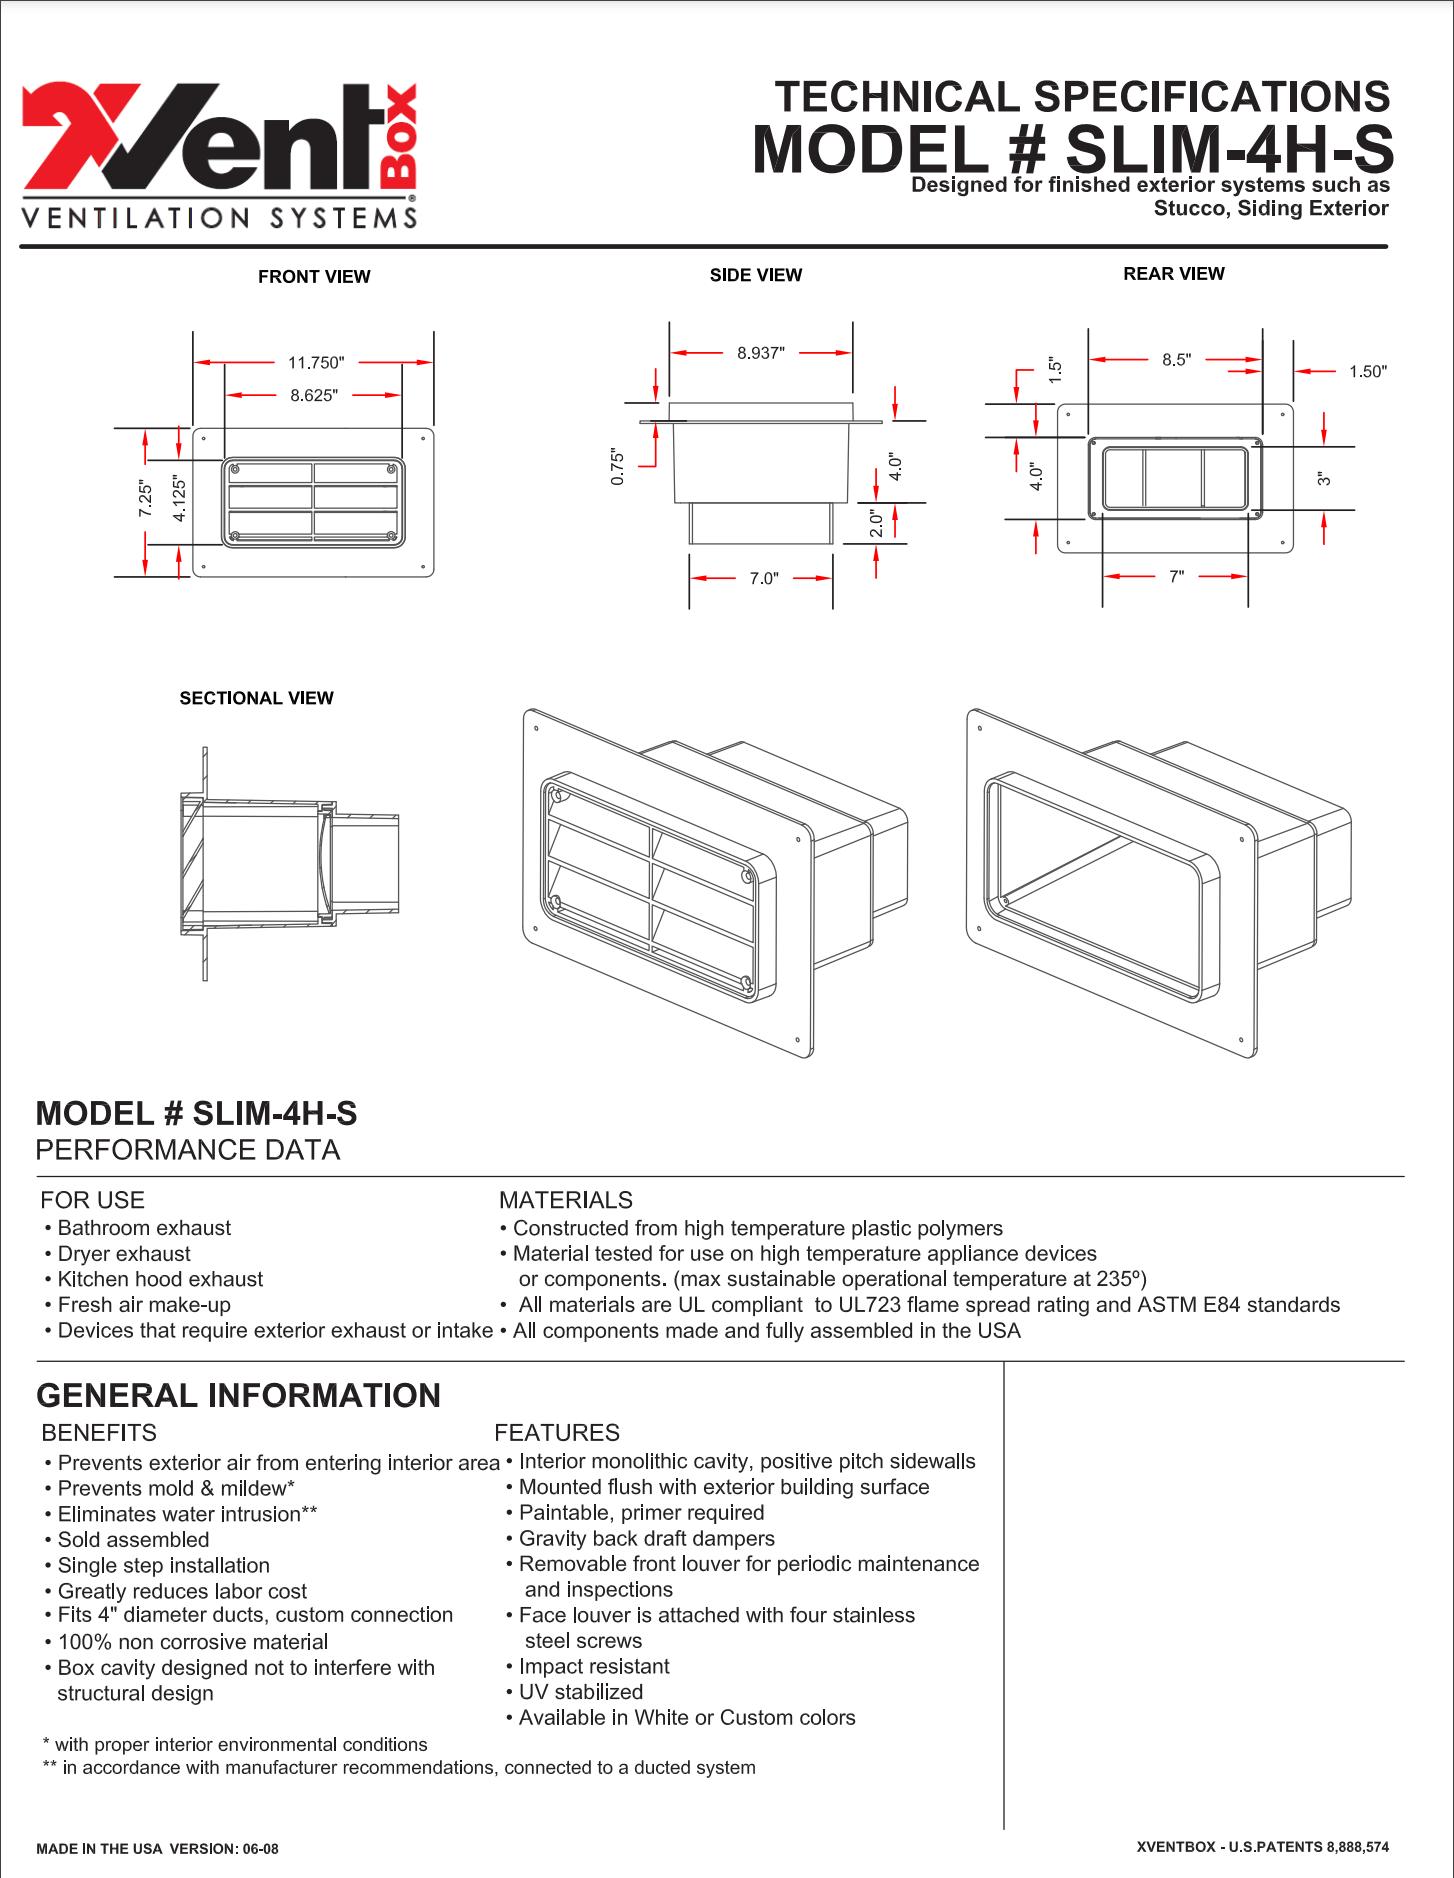 Technical Specs Image